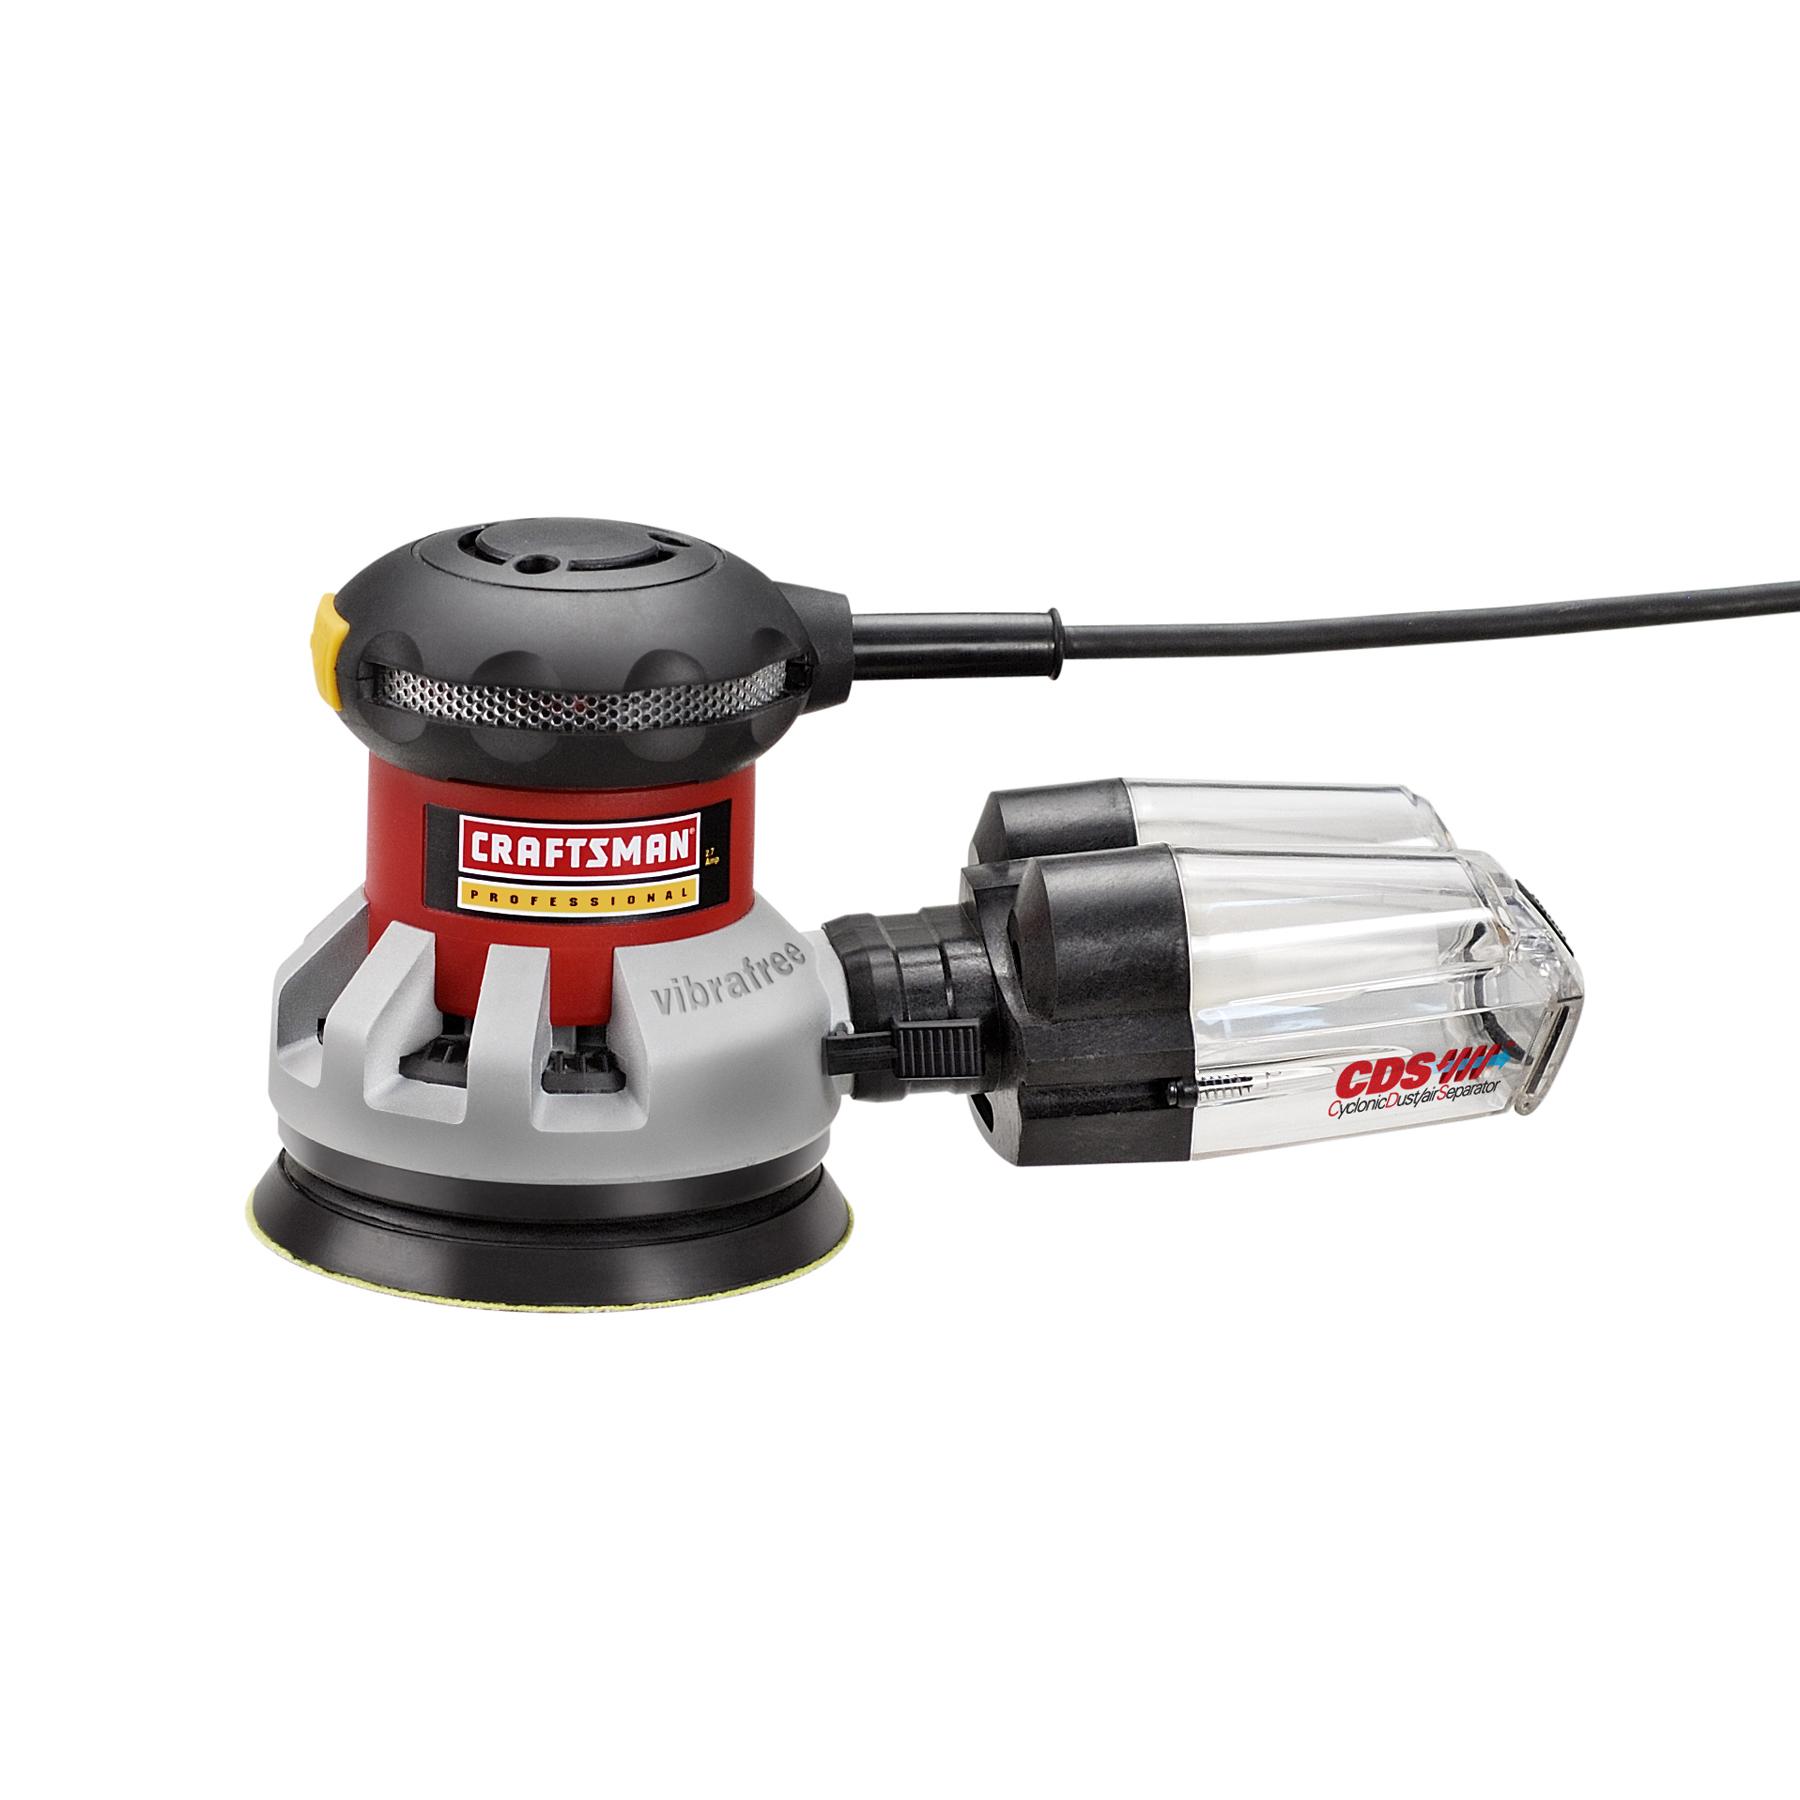 "Craftsman Professional 25927 Vibrafree™ 2.7 amp Corded 5"" Random Orbit Sander with CDS Dust Collection"